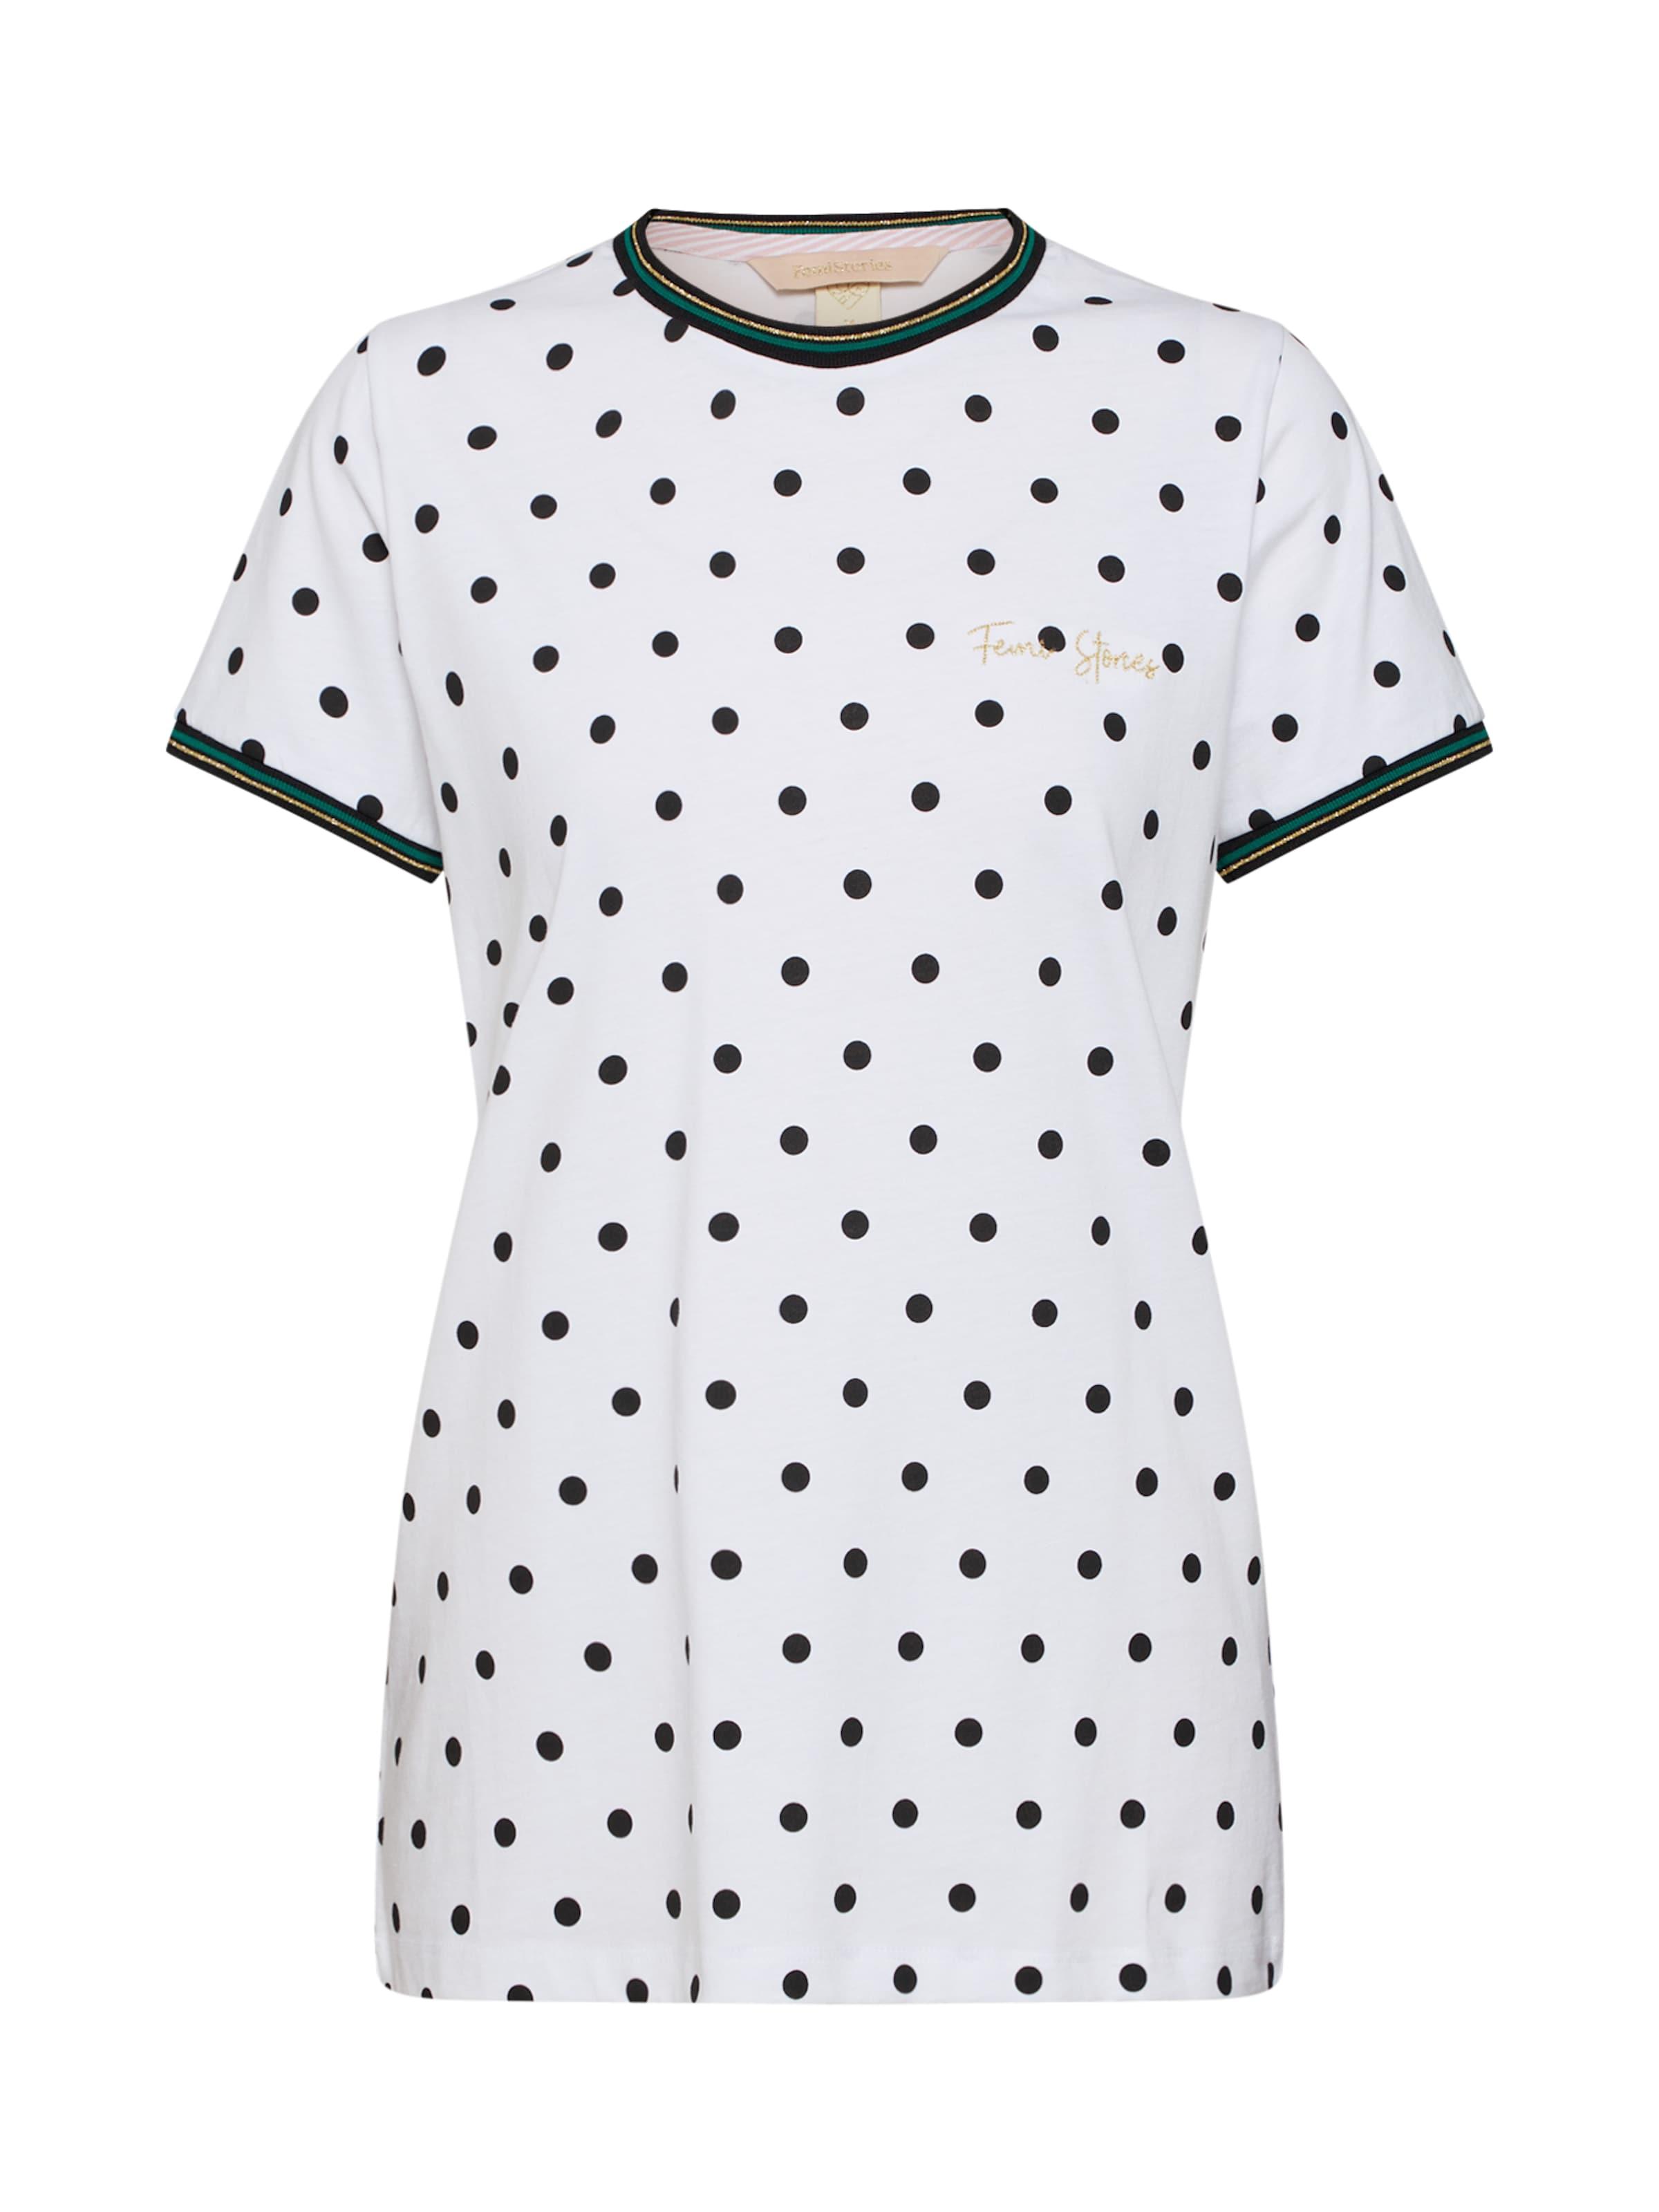 Stories shirt Blanc T Femi 'fun' En 9IEH2eYWD